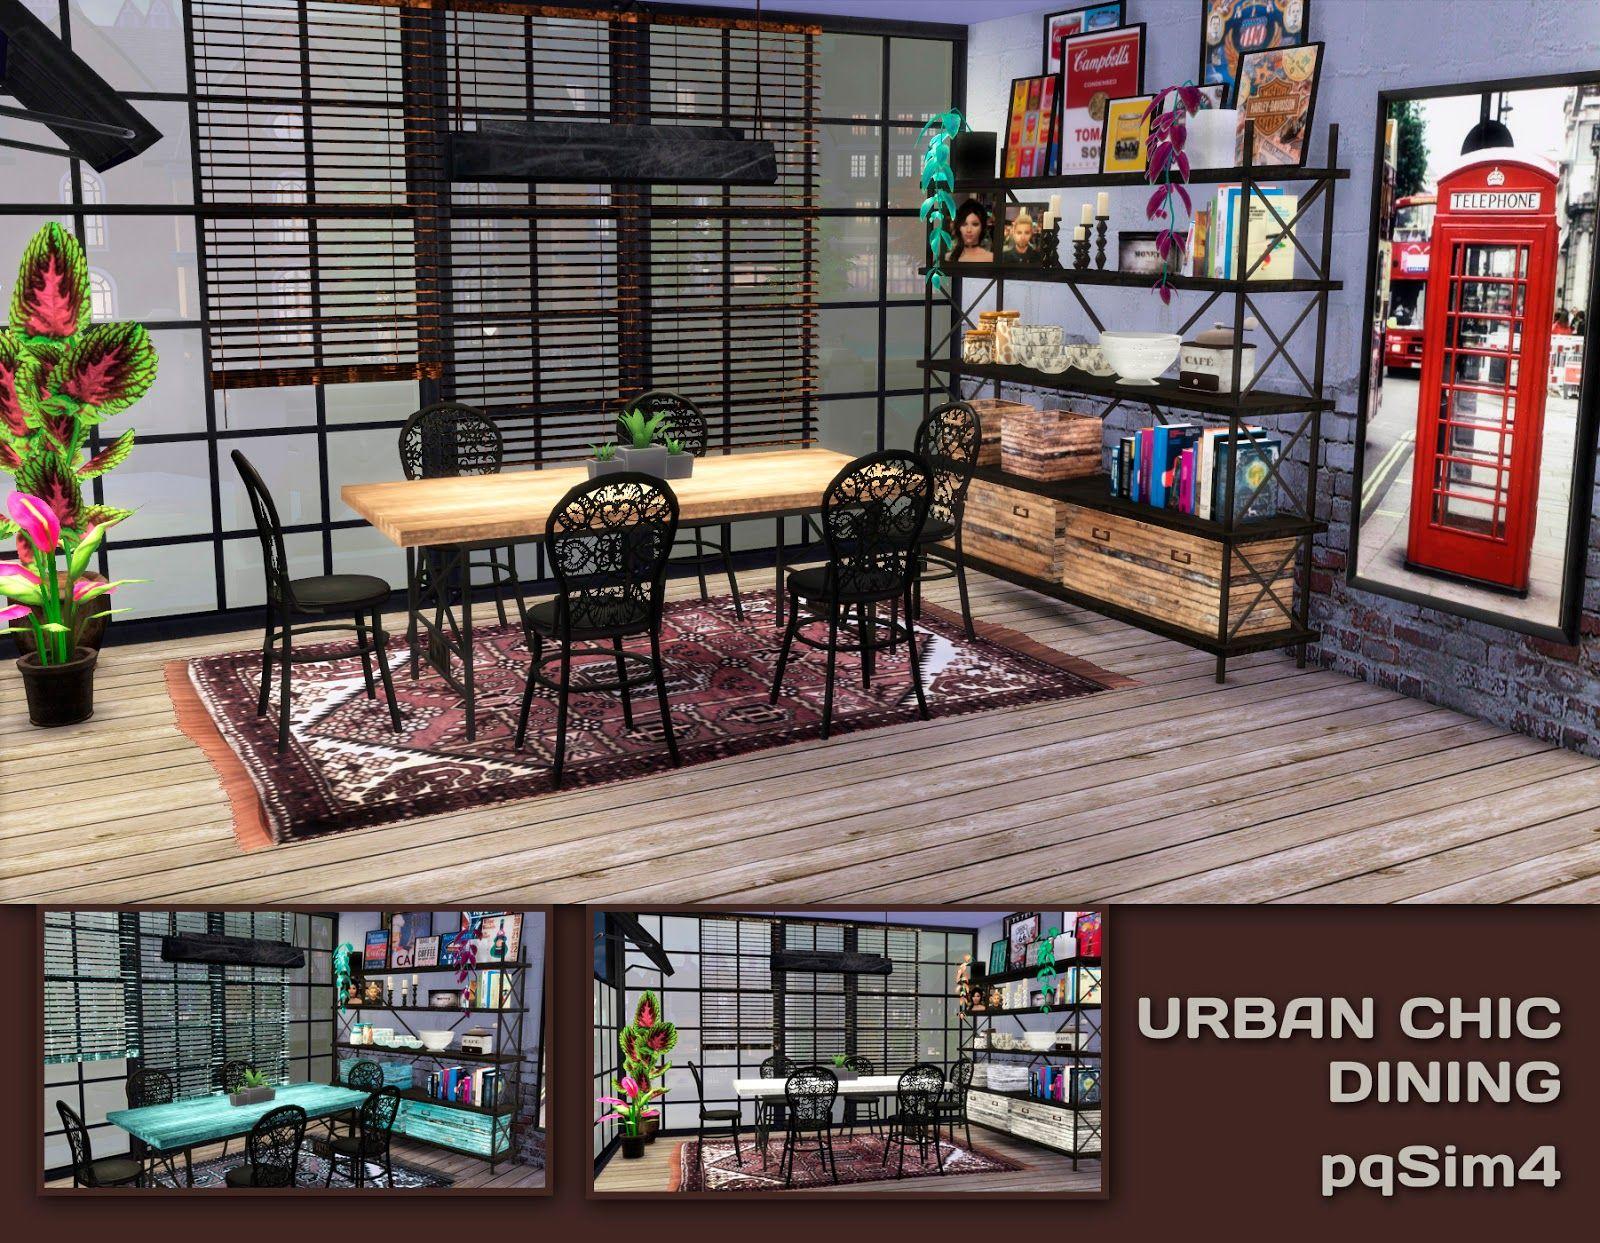 pqsim4 urban chic dining sims 4 custom content sims 4